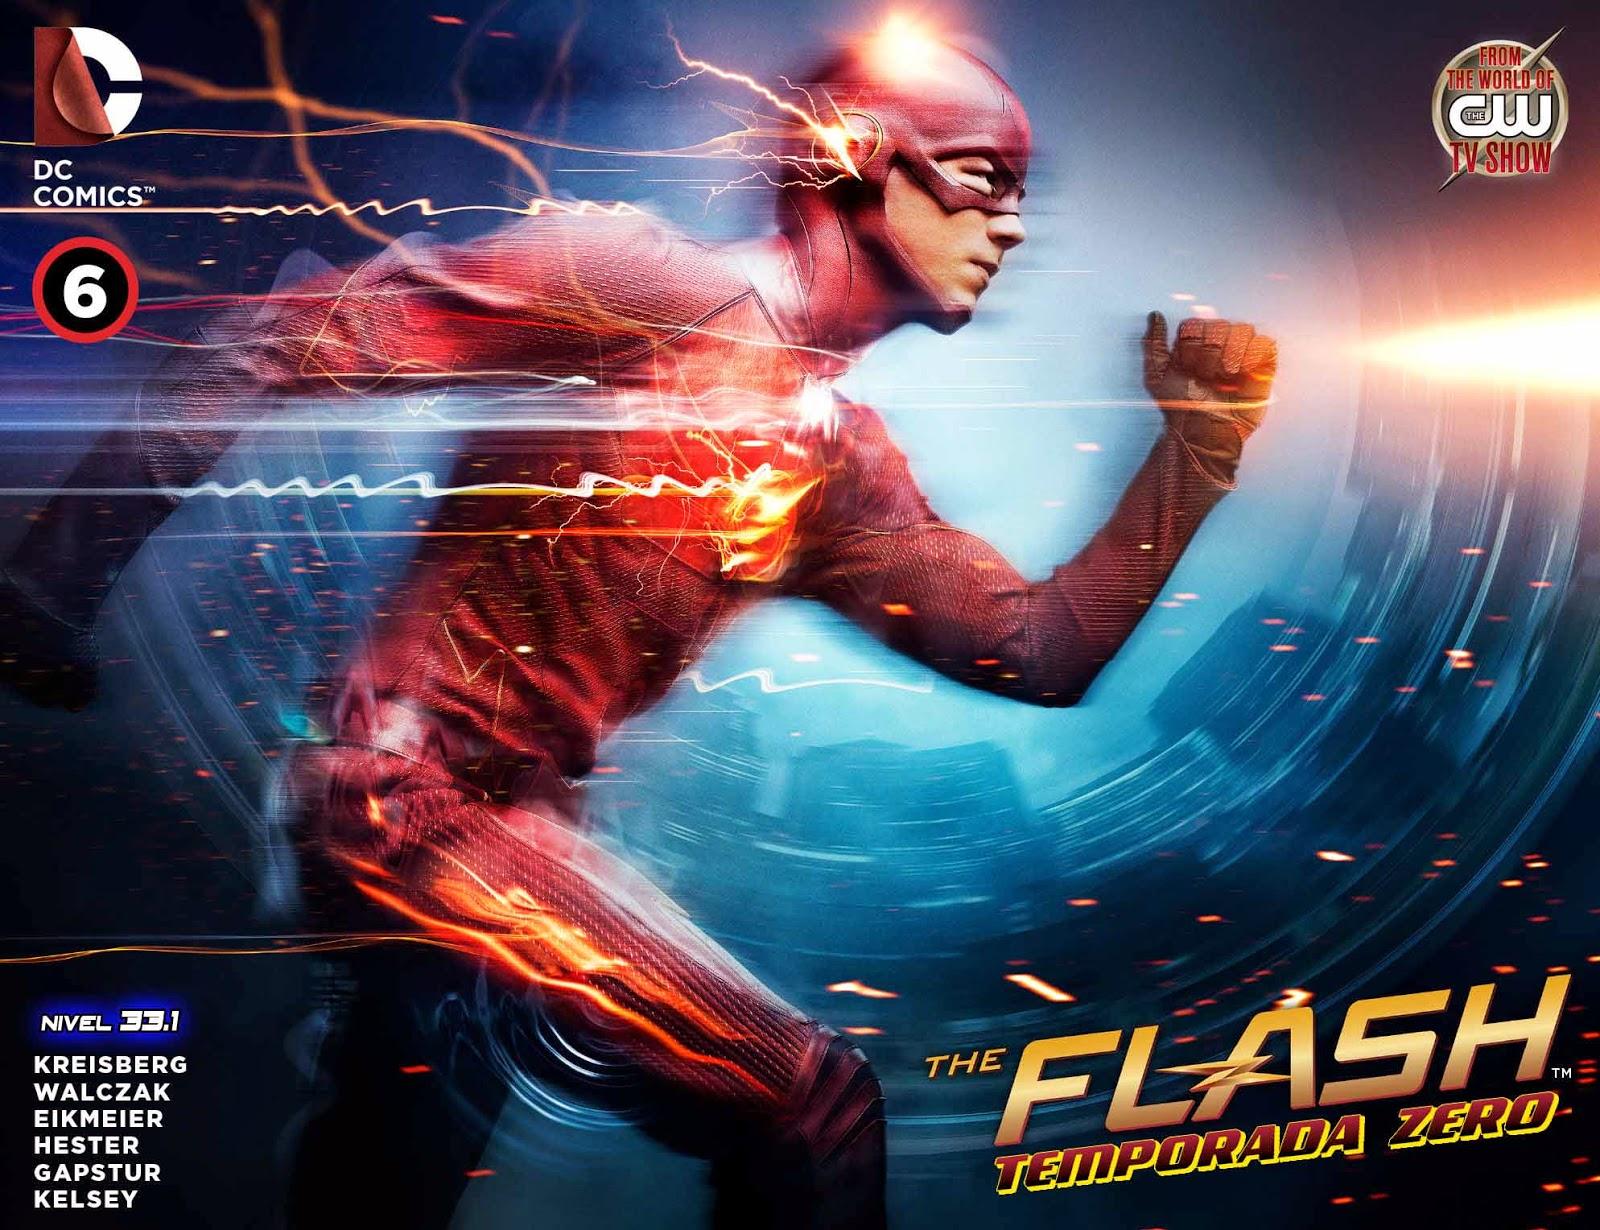 http://www.mediafire.com/download/dy2z2j0rn8m31e3/Flash+6.cbr